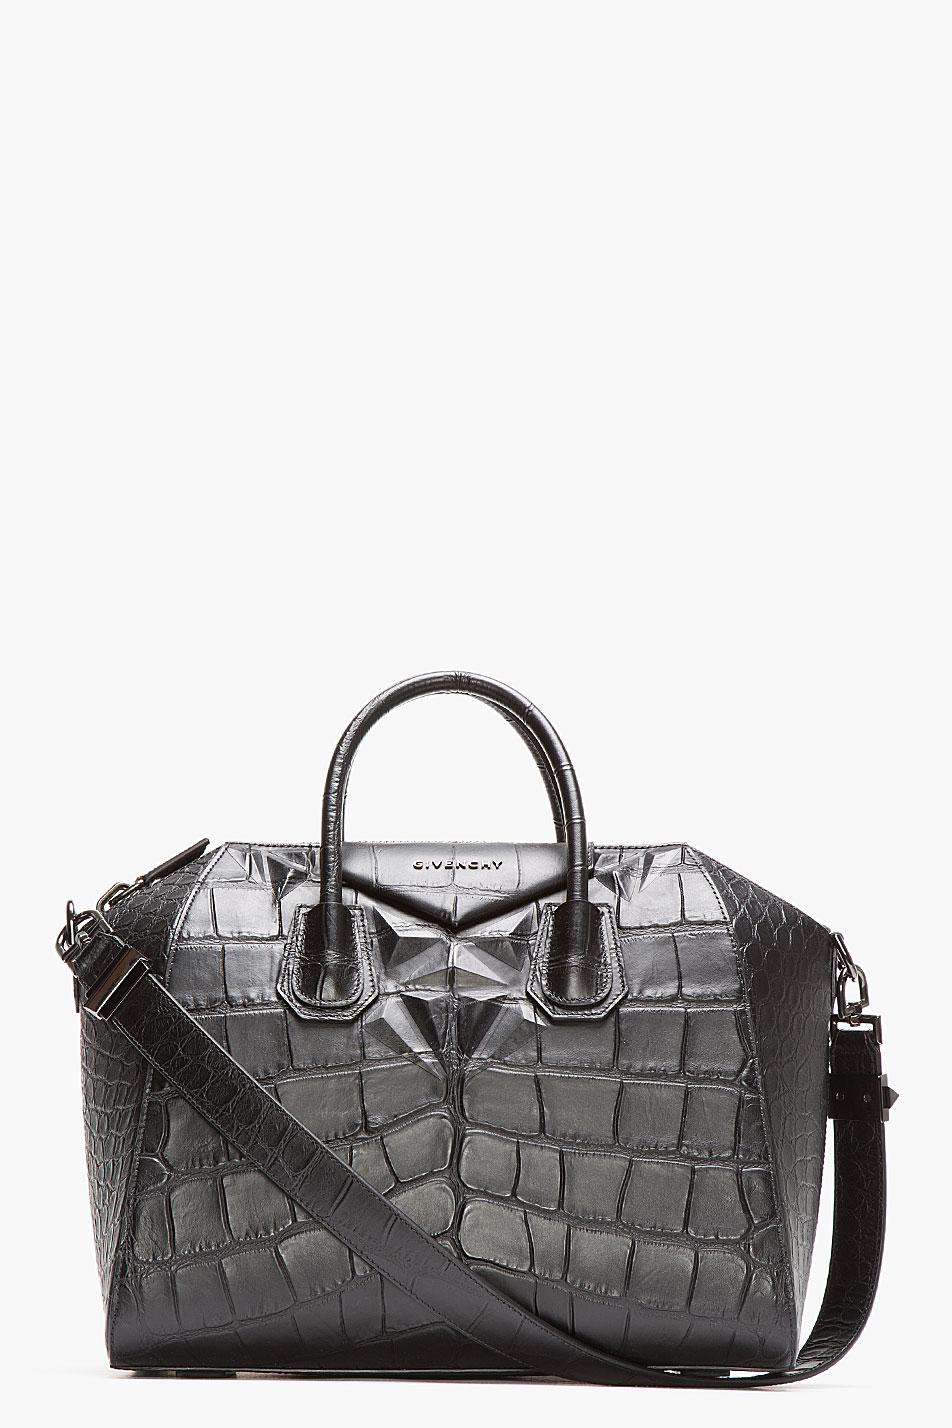 b3f29069da Givenchy Black Leather Croc Embossed Antigona Duffle Bag in Gray - Lyst